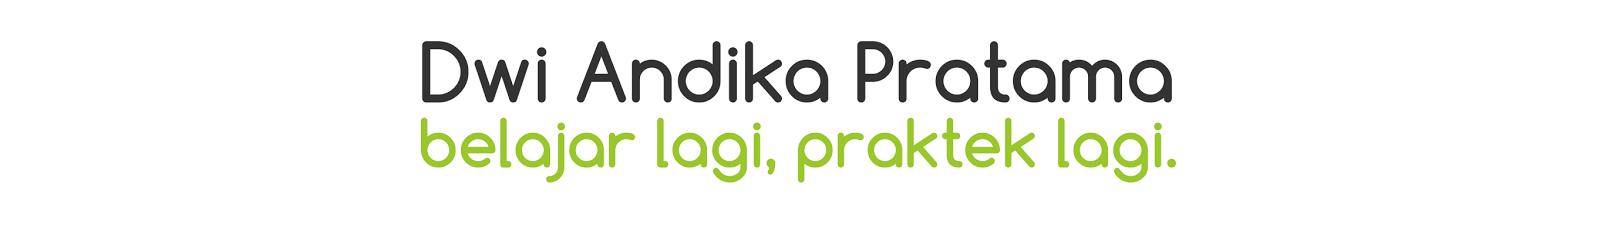 Dwi Andika Pratama